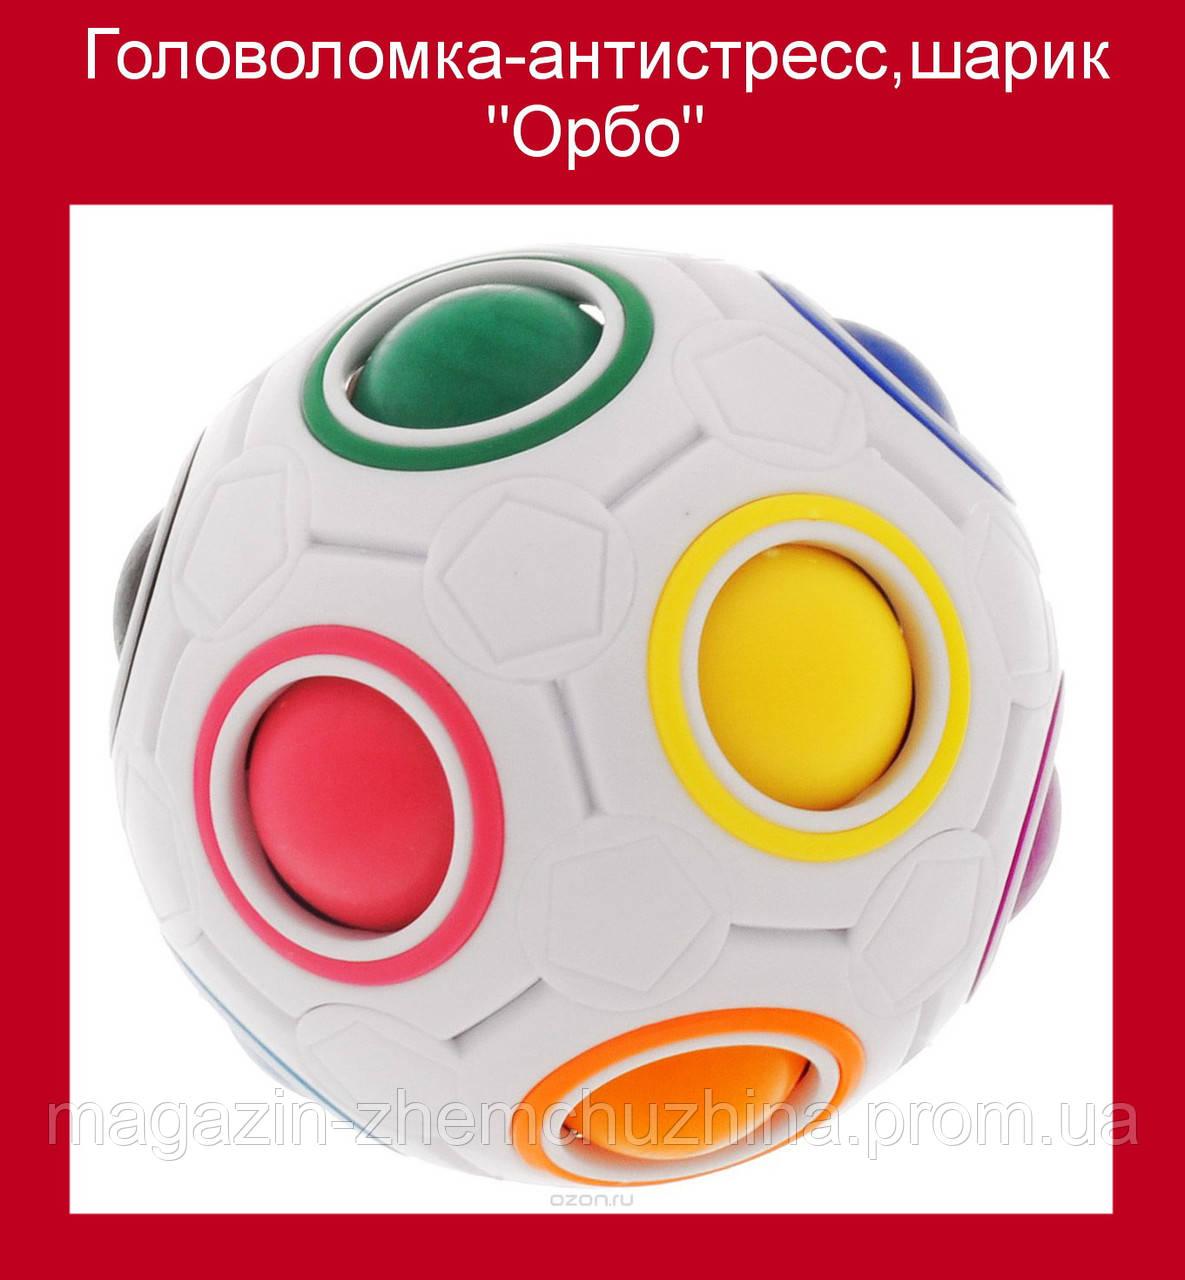 "Головоломка-антистресс,шарик ""Орбо"" - Магазин ""Жемчужина"" в Черноморске"